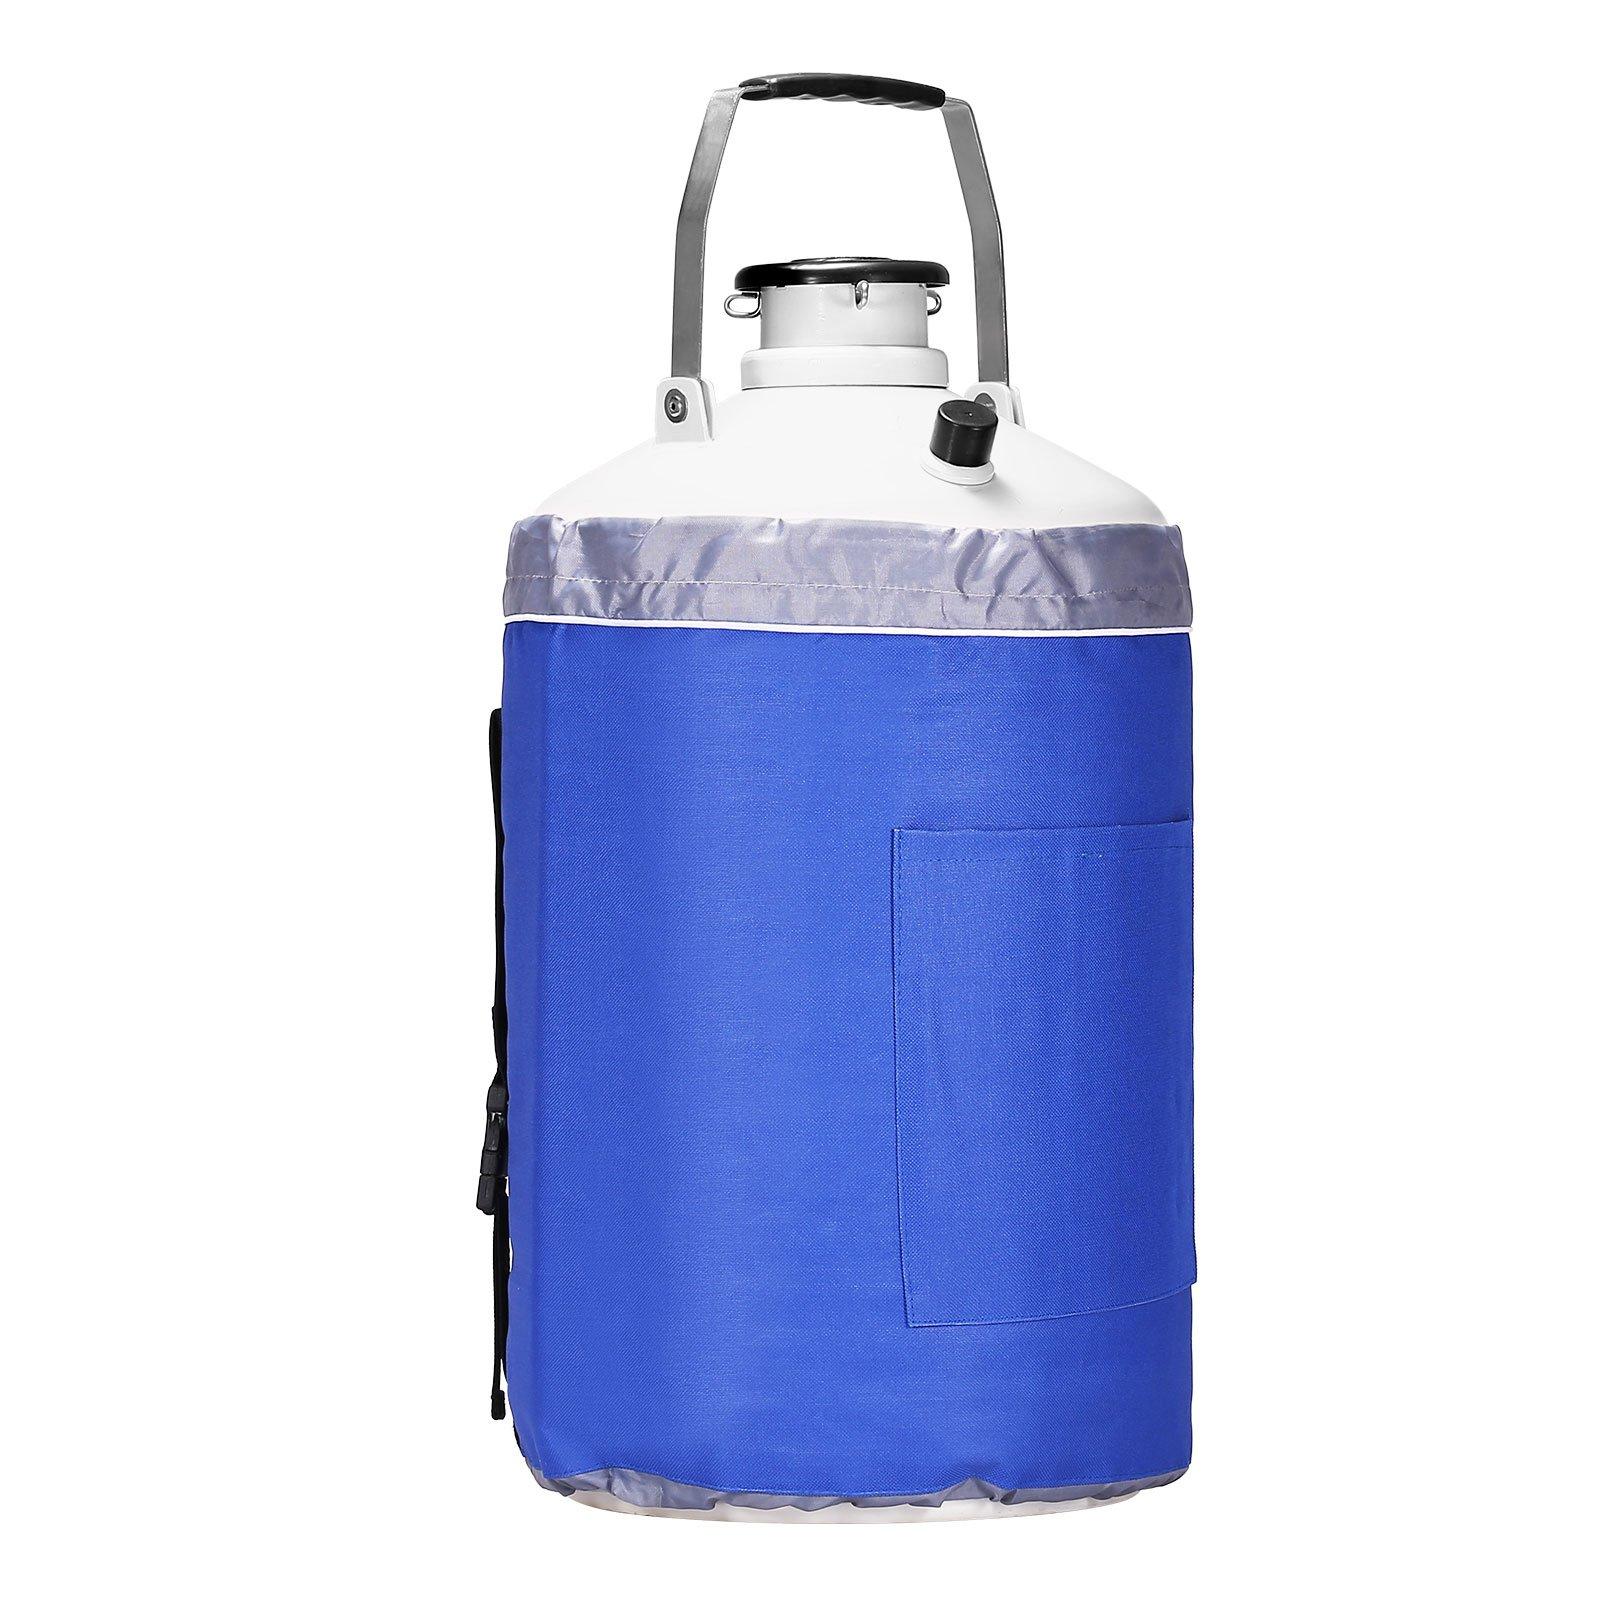 BestEquip Liquid Nitrogen Container Aluminum Alloy Liquid Nitrogen Tank Cryogenic Container with 3 Canisters and Carry Bag (10L)